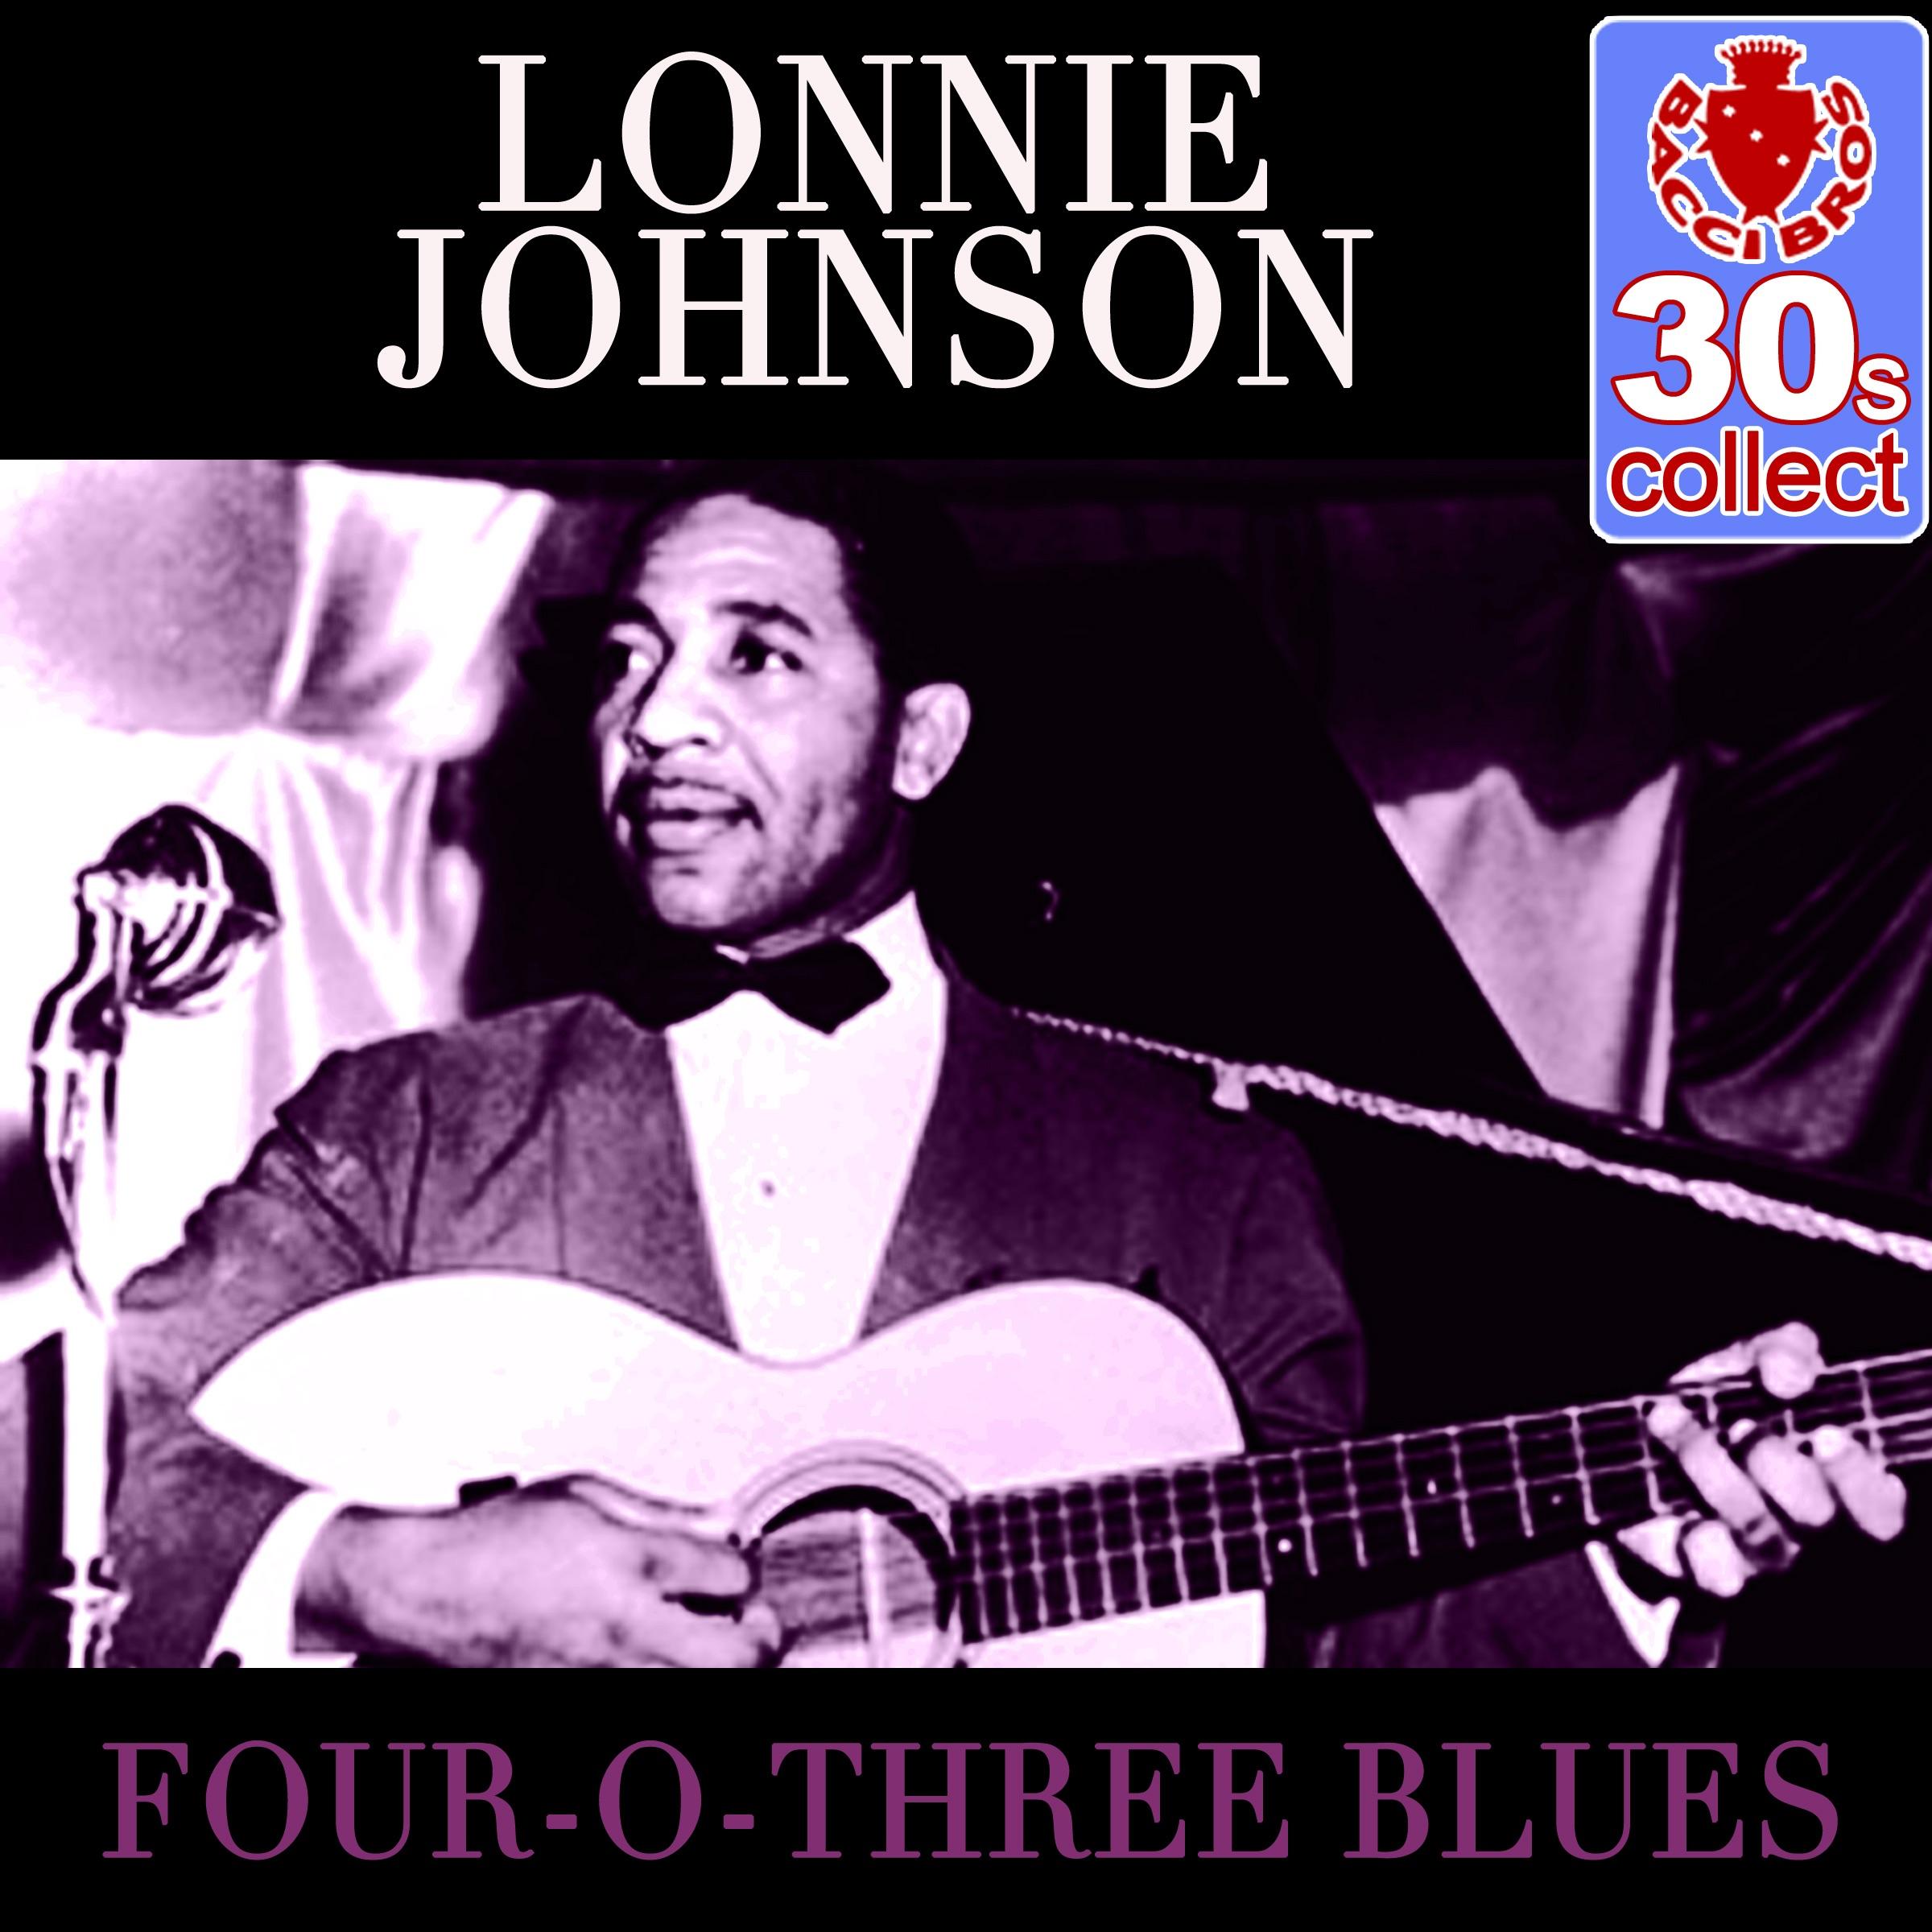 Four-o-Three Blues (Remastered) - Single